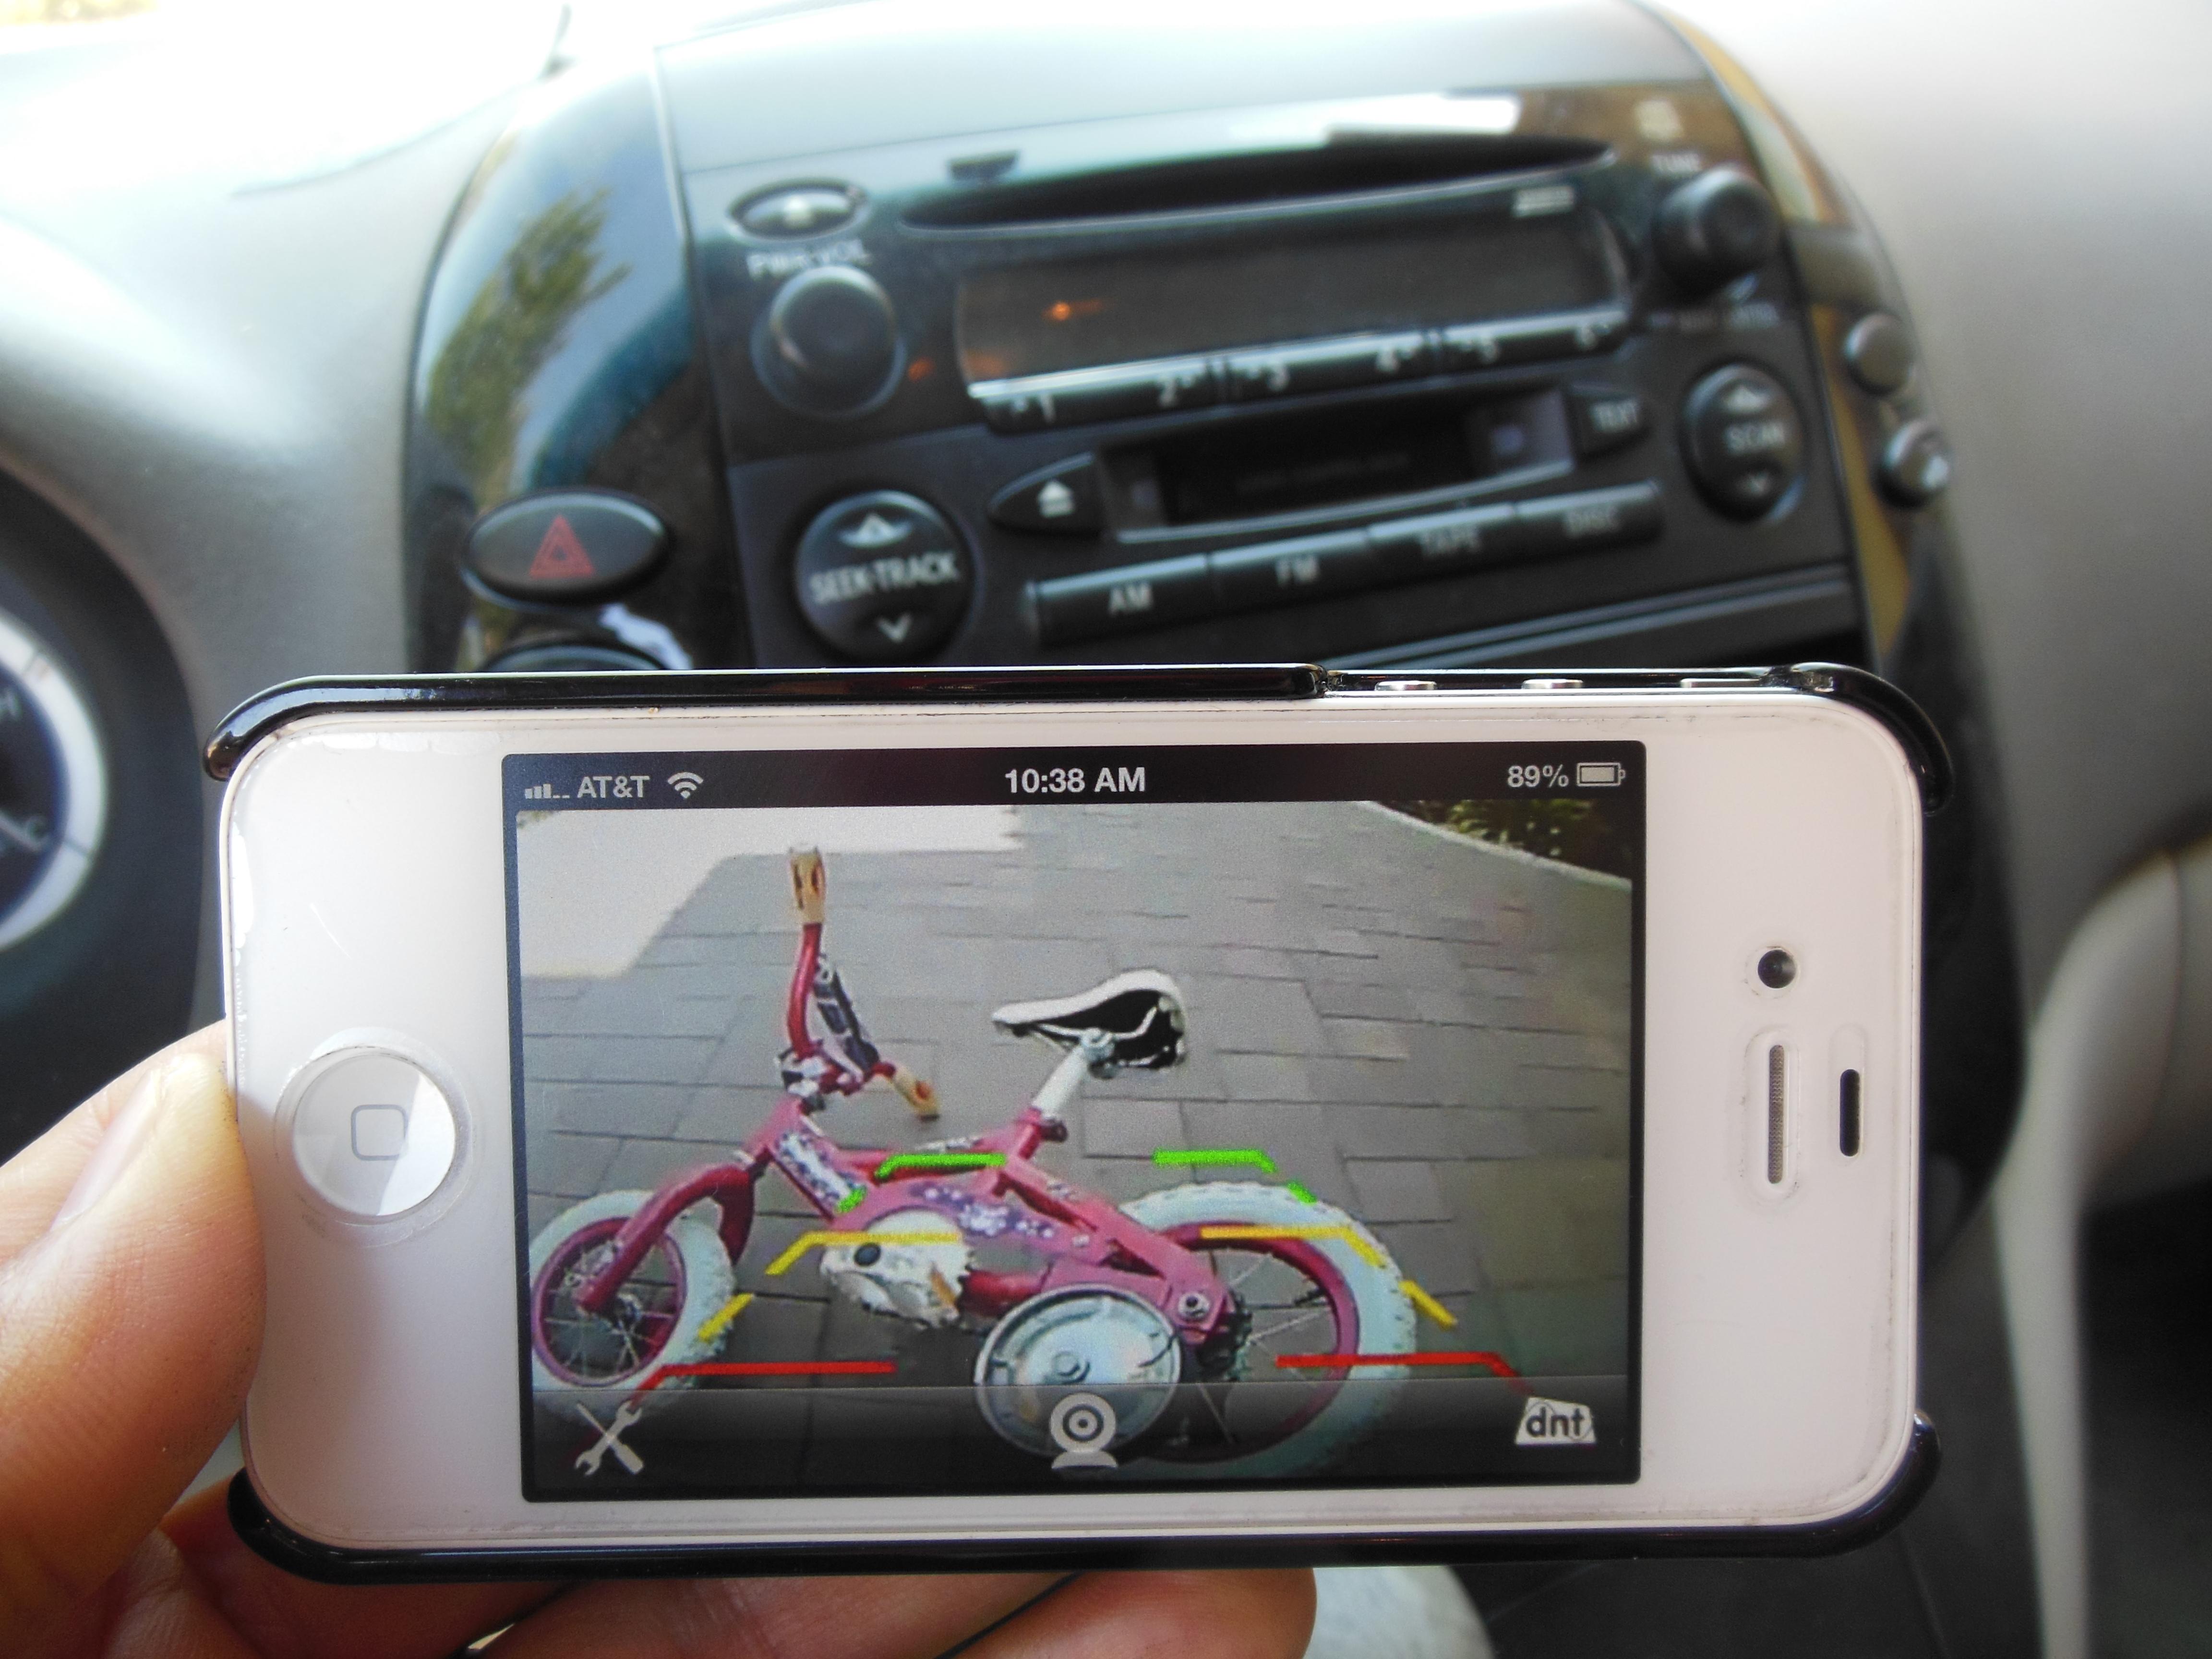 iPhone Android iPad WIFI car backup camera